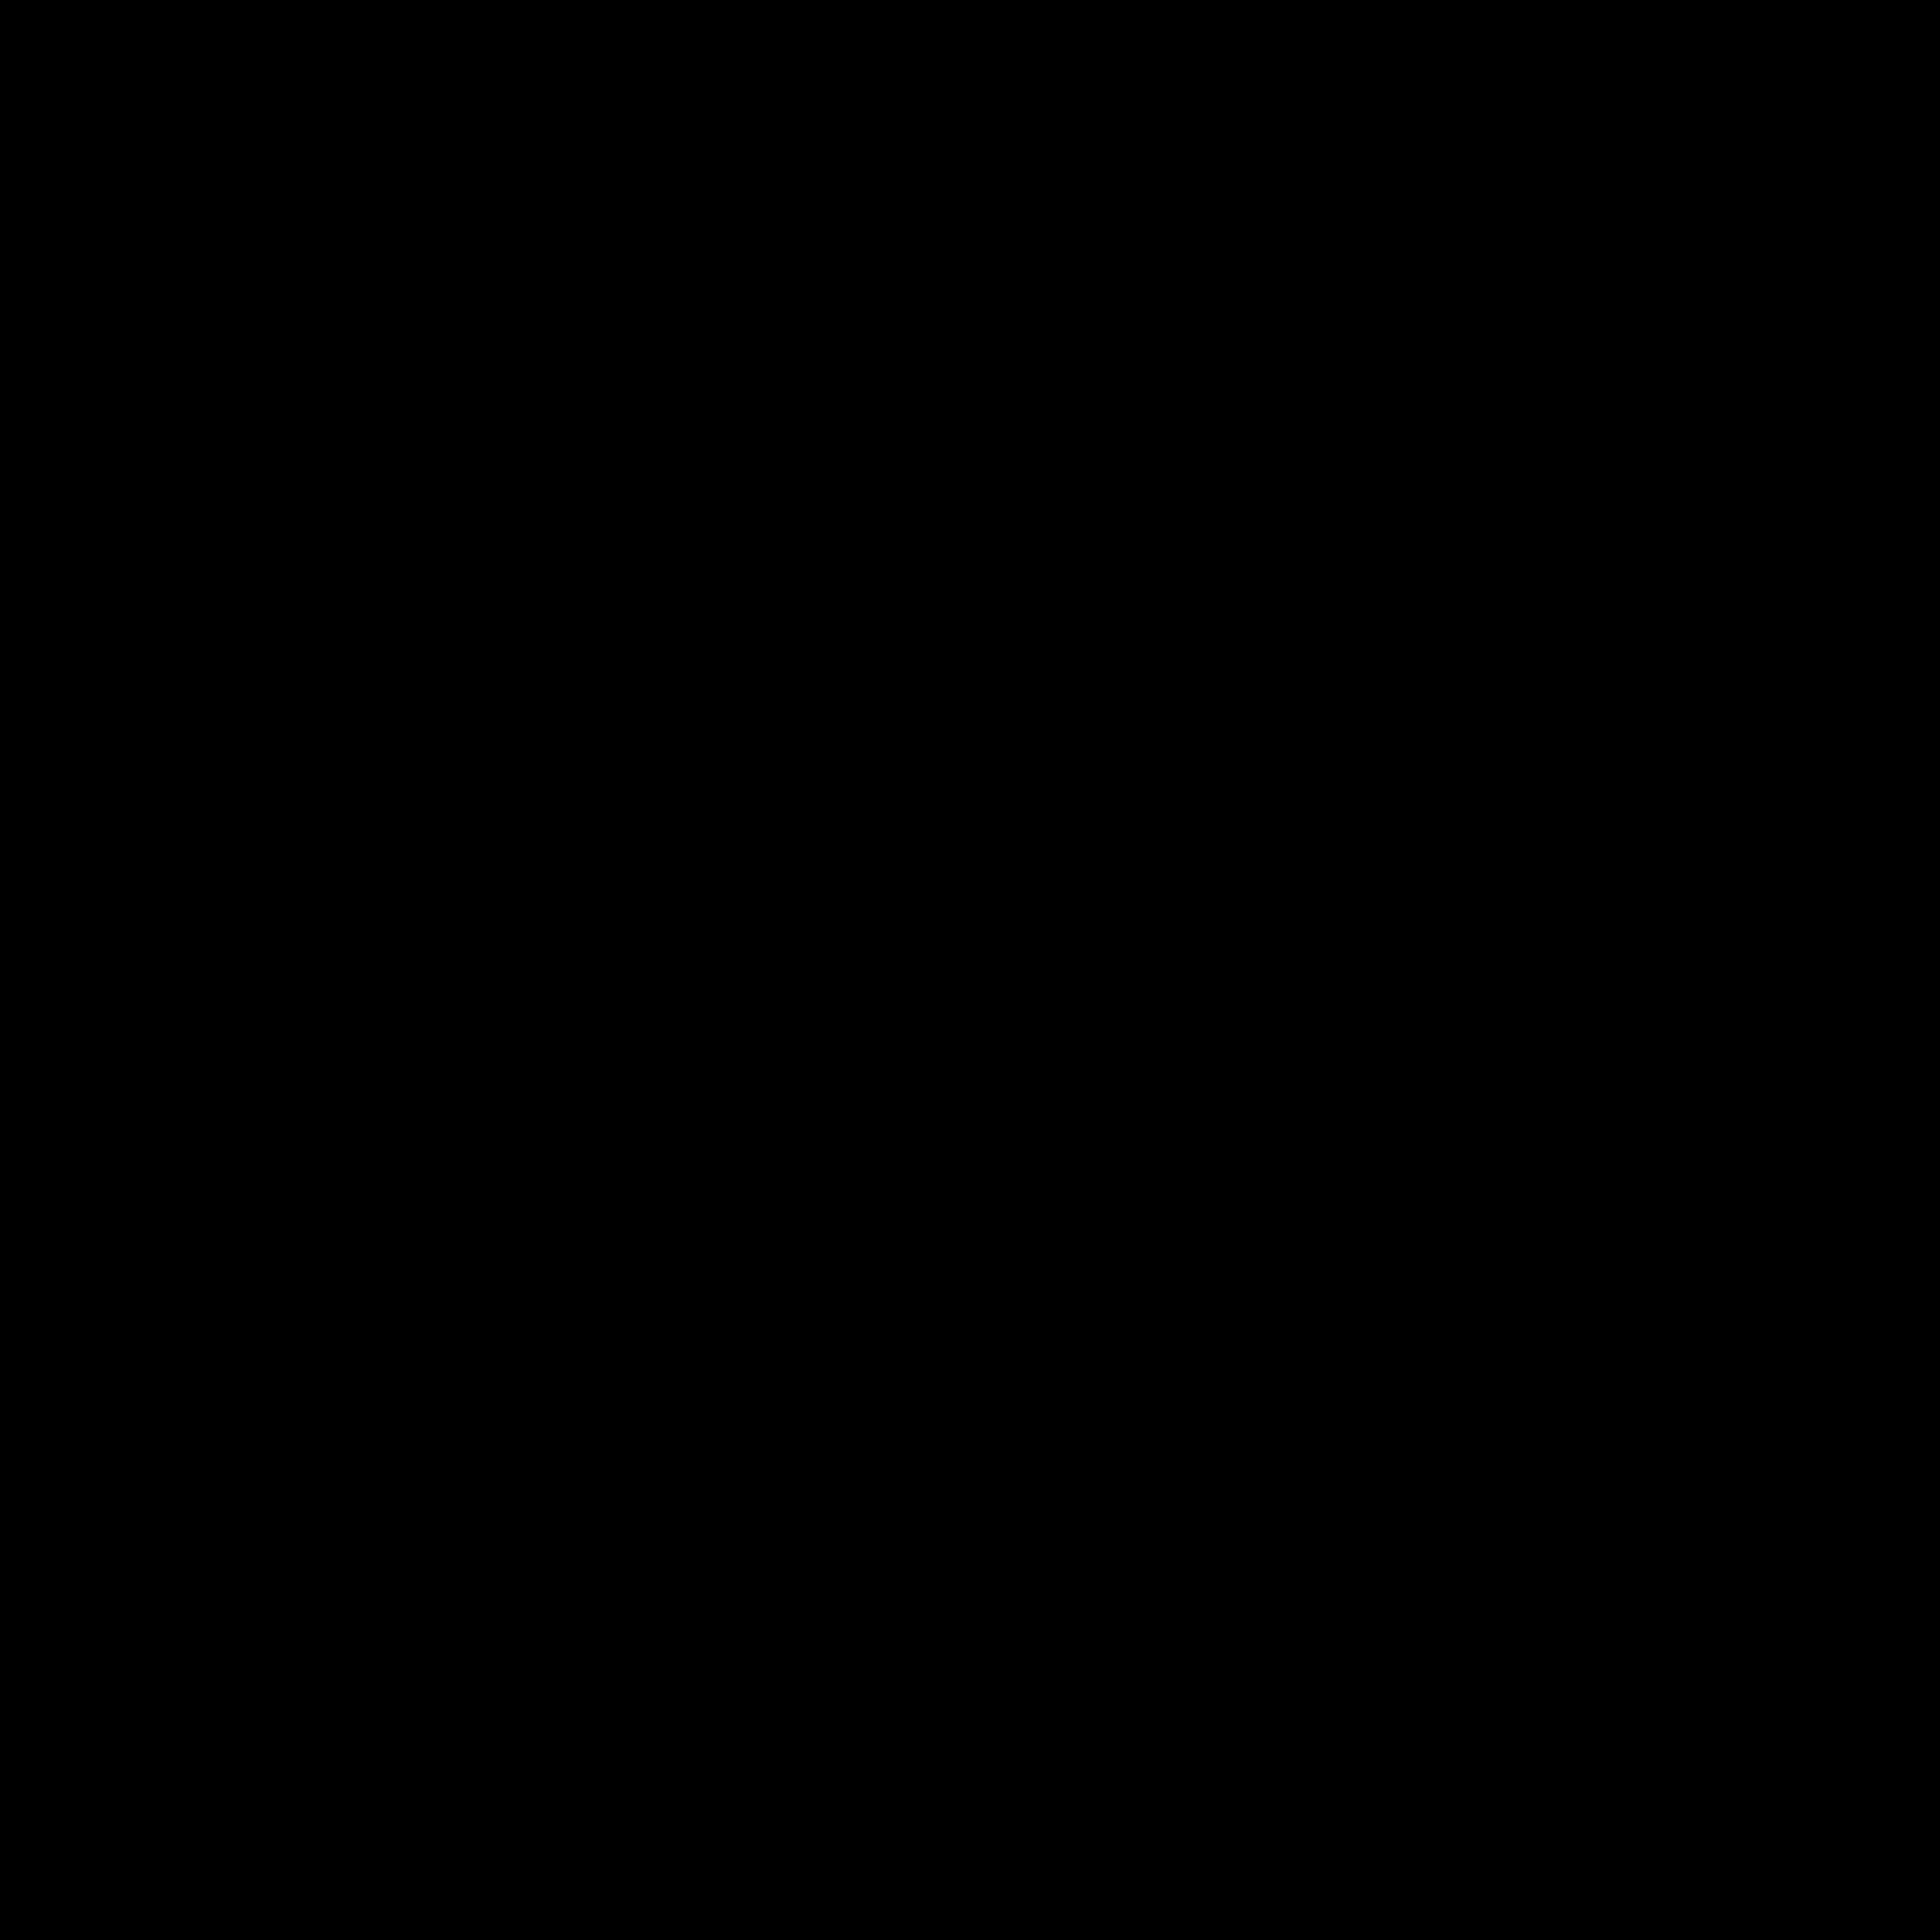 Almay's logo